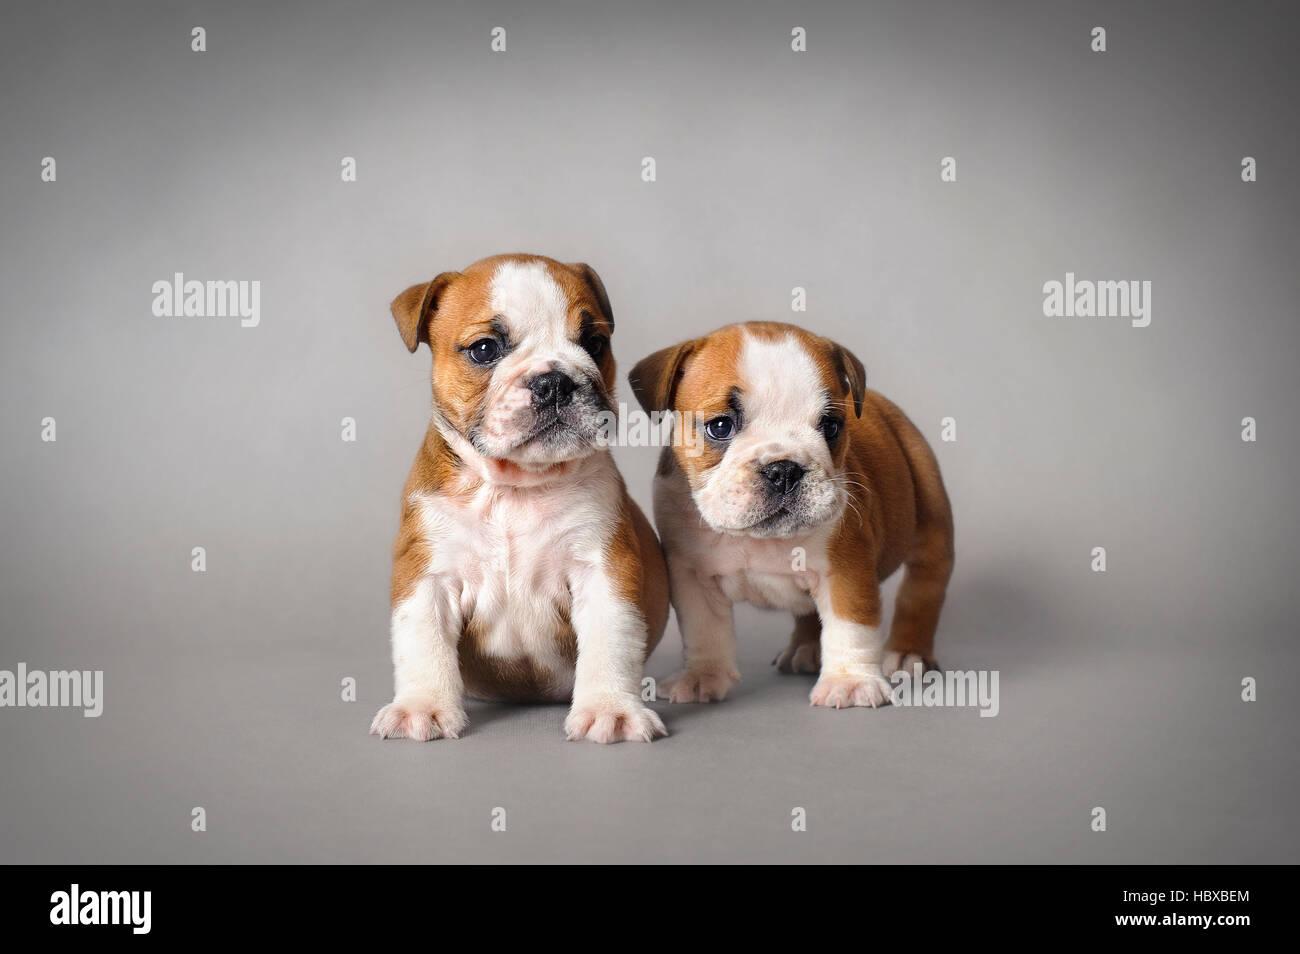 English Bulldog Puppies On Grey Background Stock Photo Alamy